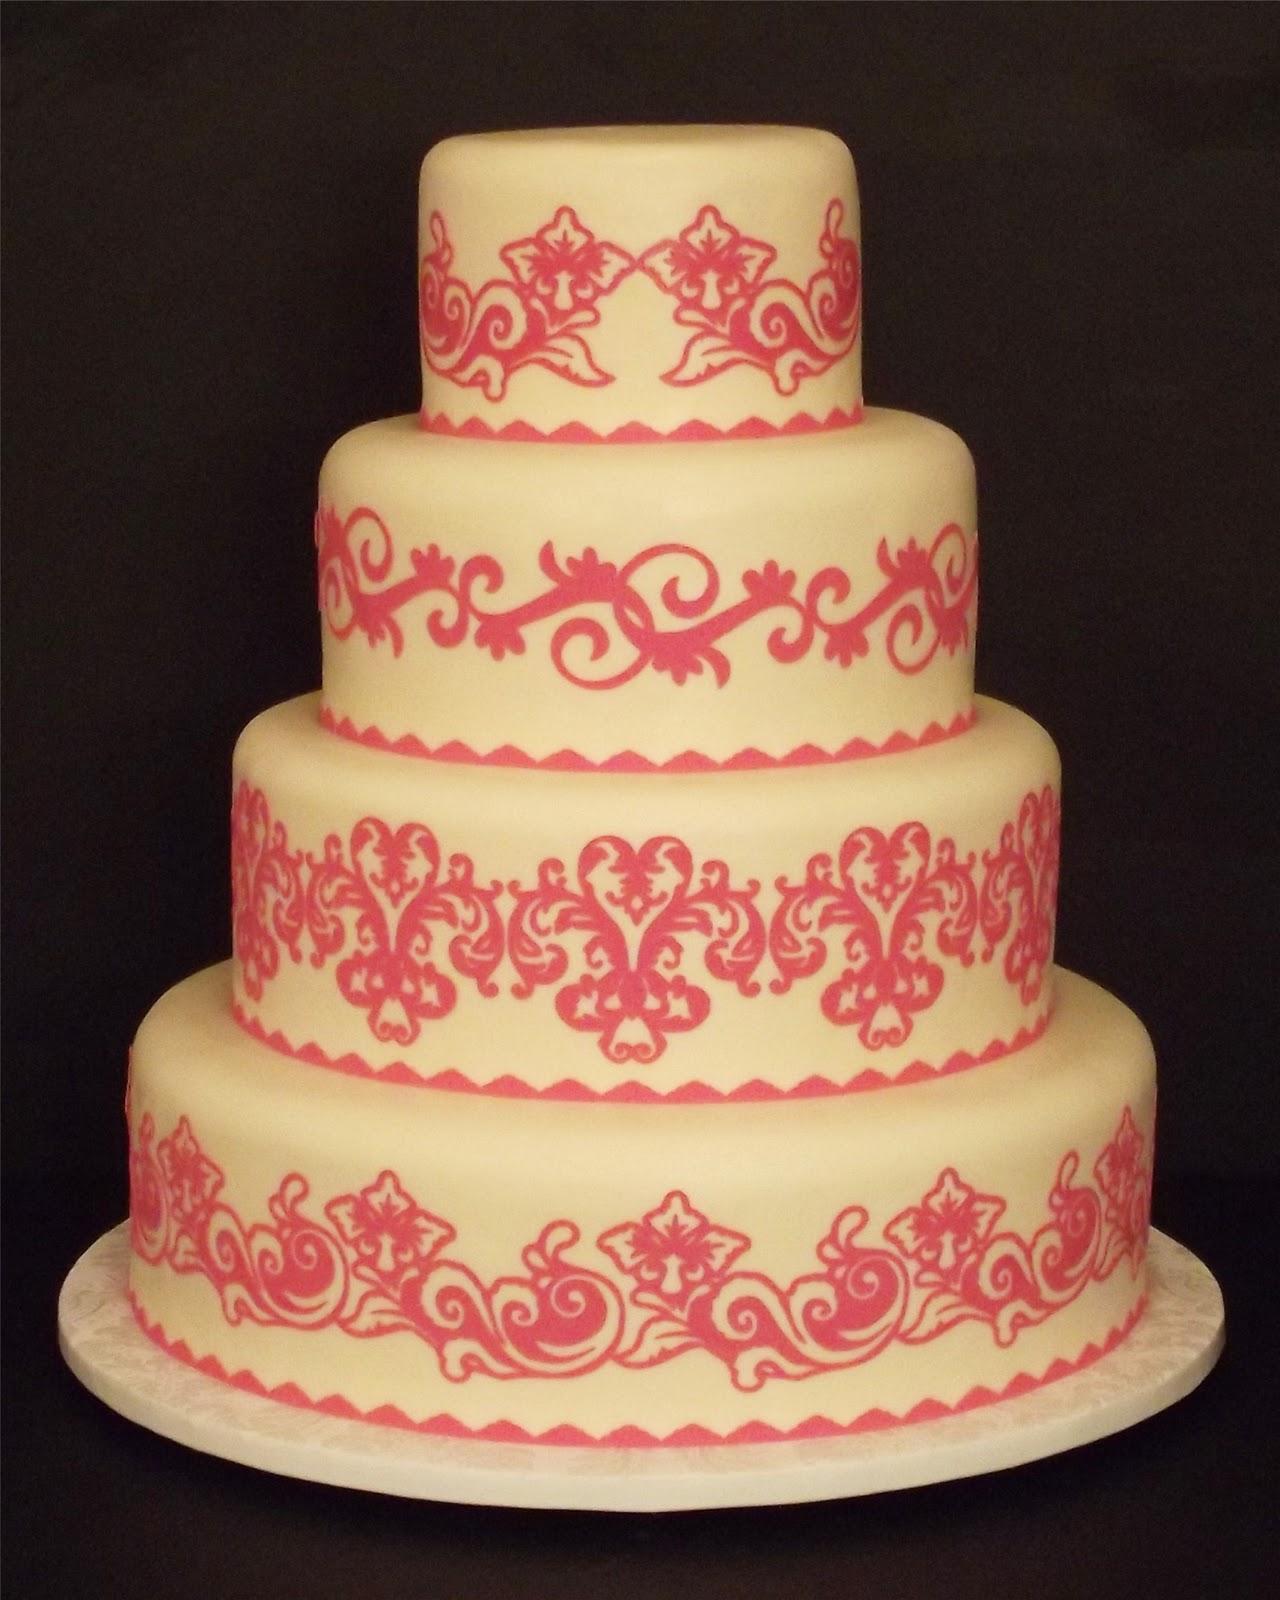 Creative Designs For Cakes: Pre-Cut Wedding Cake Designs